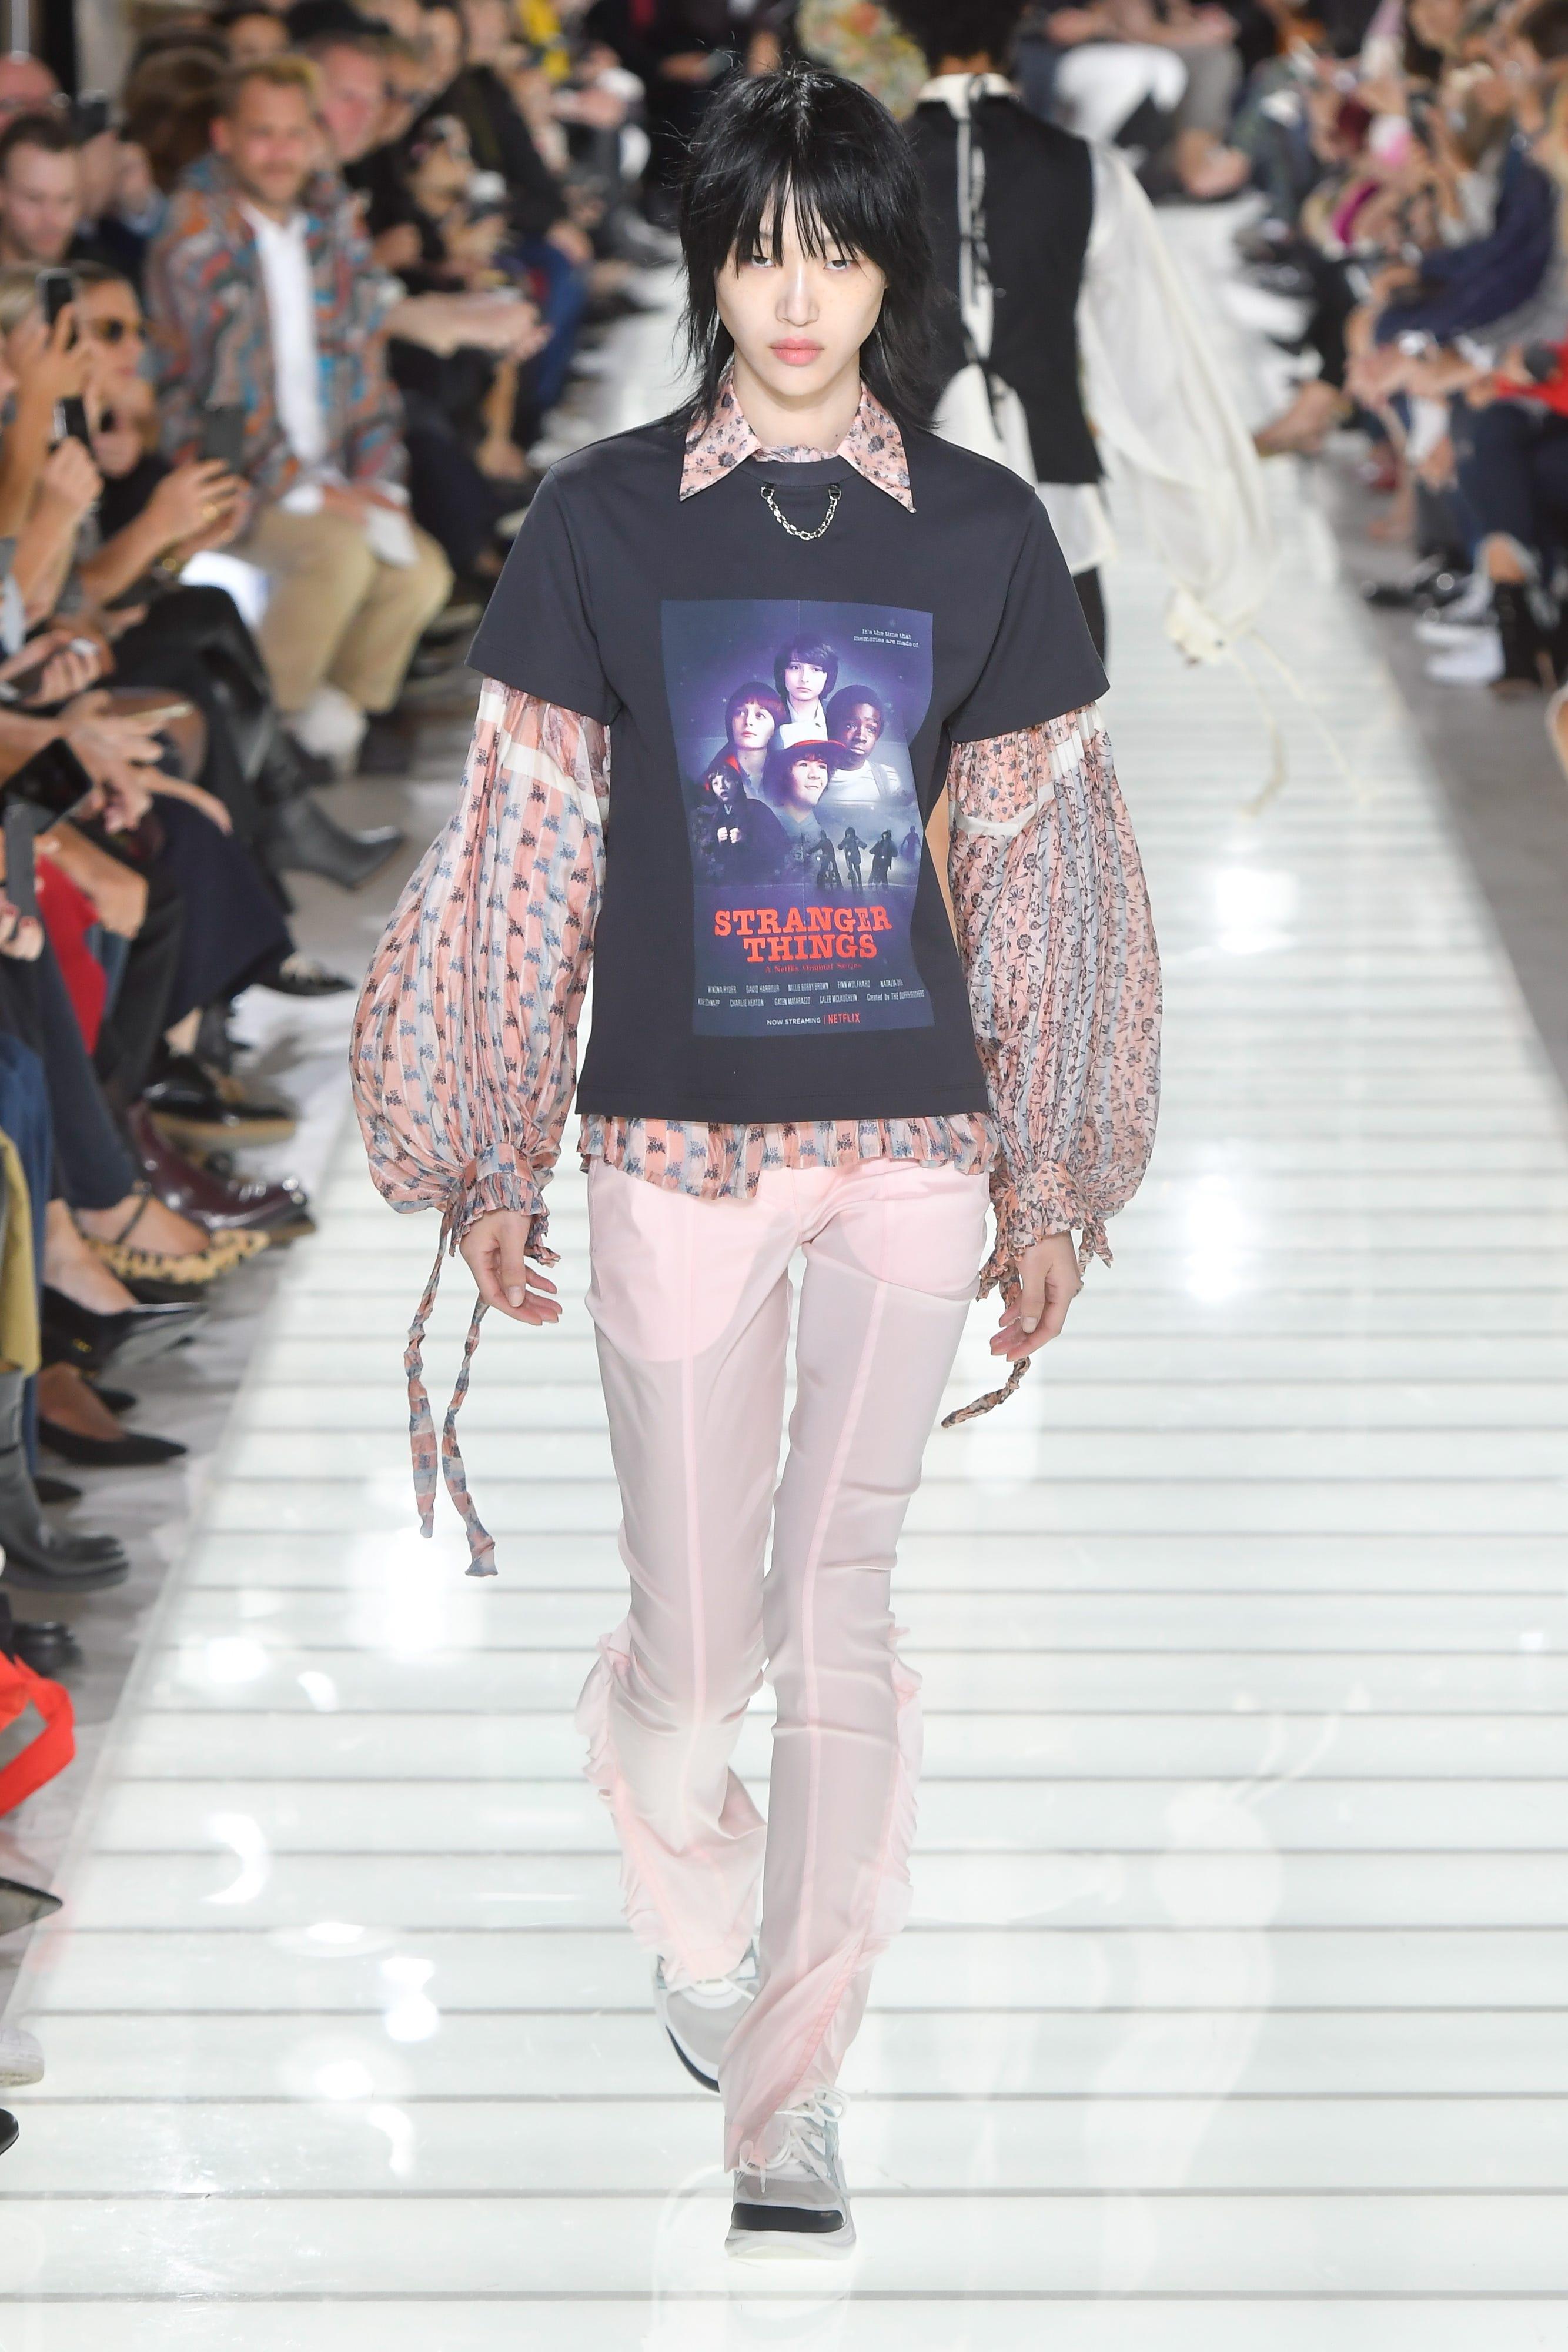 Tipshow Fashion to dress like jenny humphrey